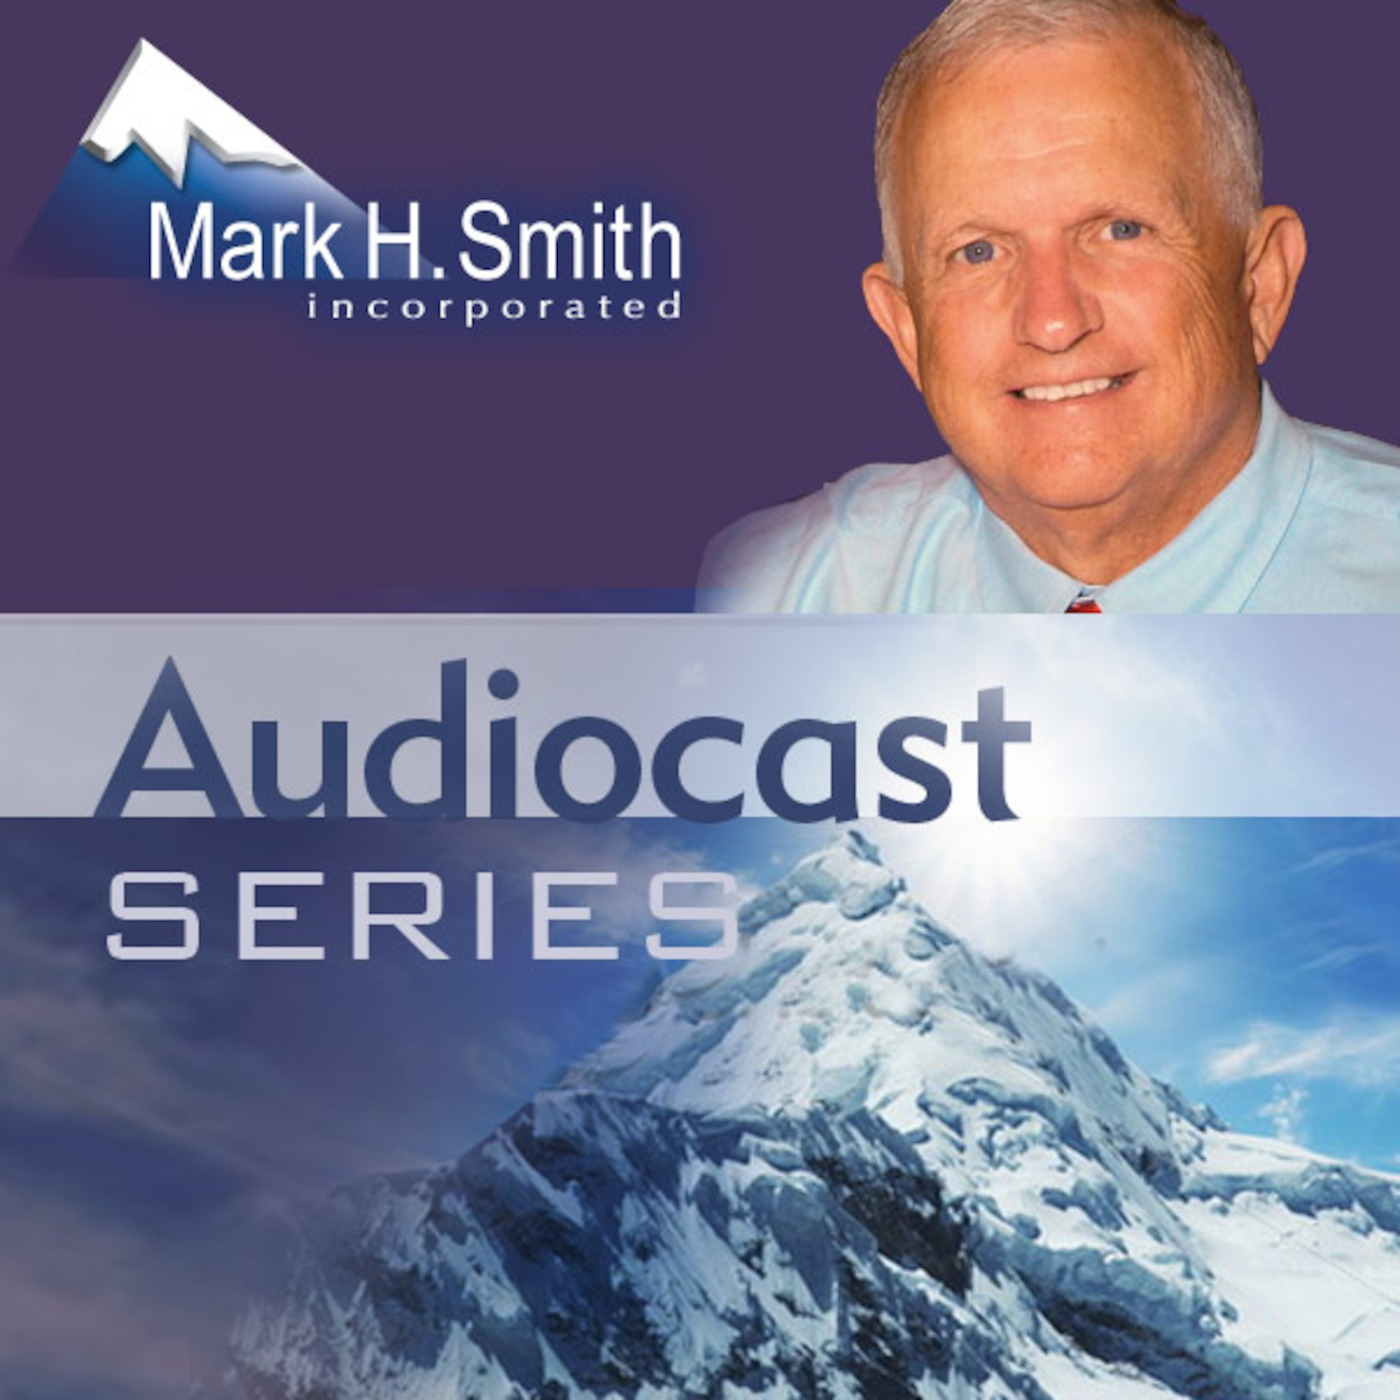 Mark H. Smith's Podcast